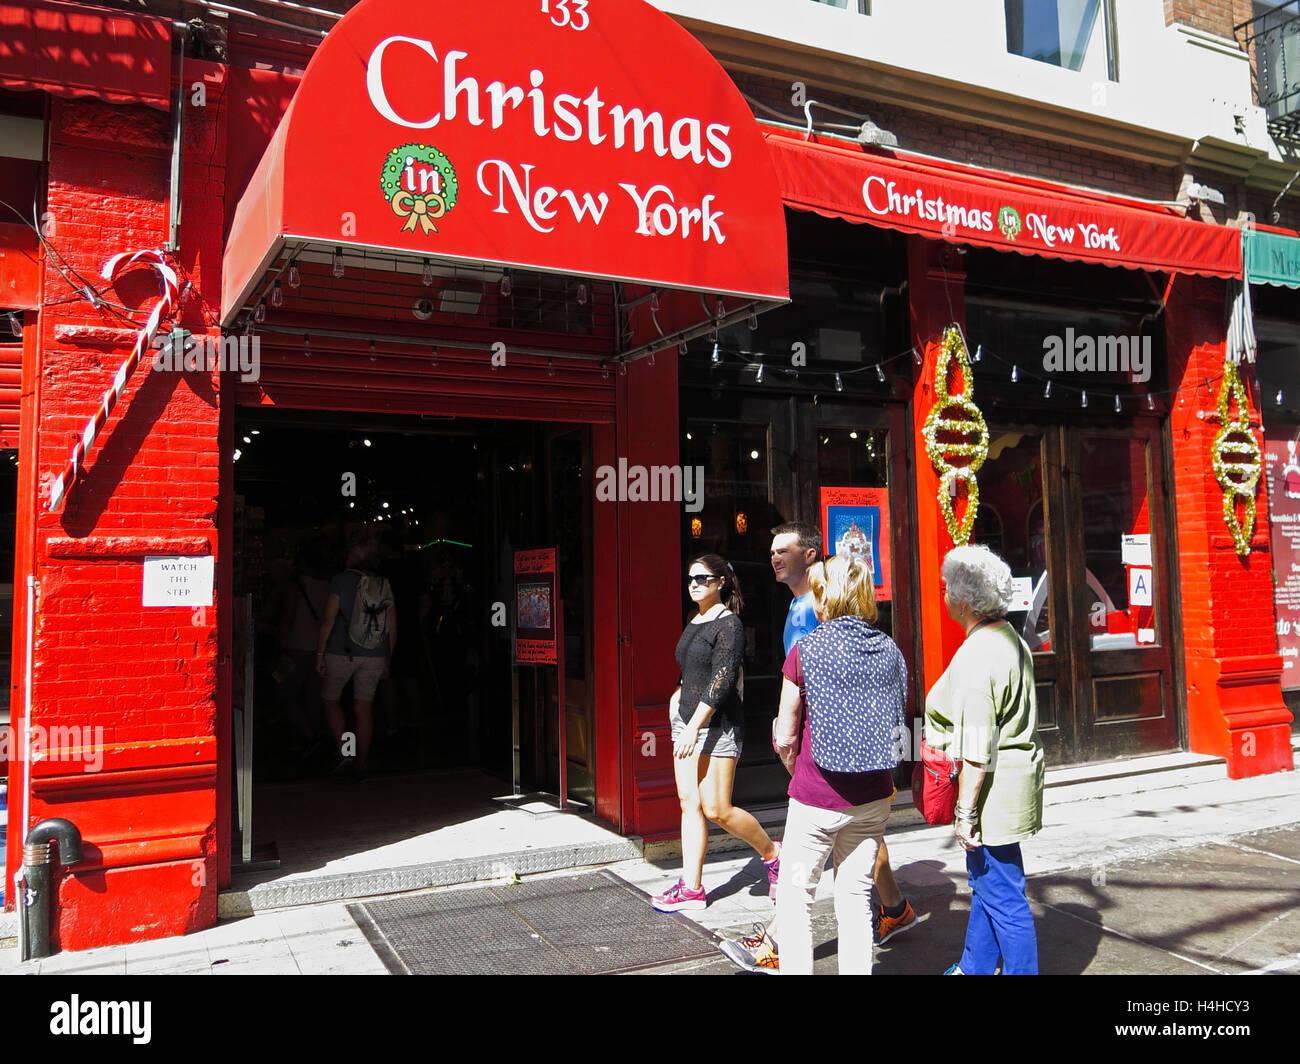 Little Christmas Italy.Christmas Shop New York Little Italy Manhattan New York